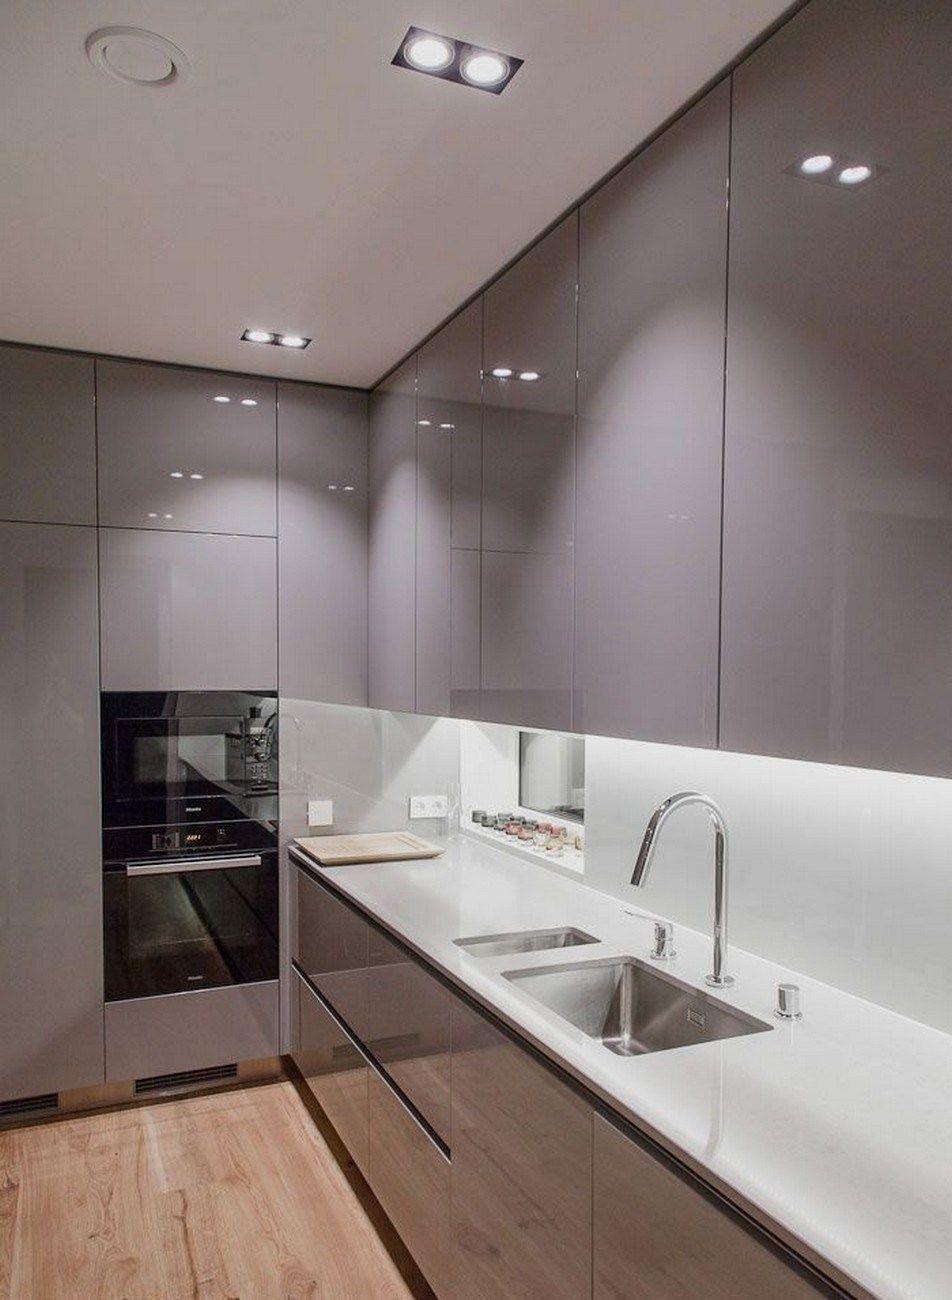 52 Most Beautiful Modern Kitchen Cabinets Ideas 23 Fieltro Net Beautiful Cabinets Fi In 2020 Kuchengestaltung Moderne Kuchenideen Luxus Kuche Design